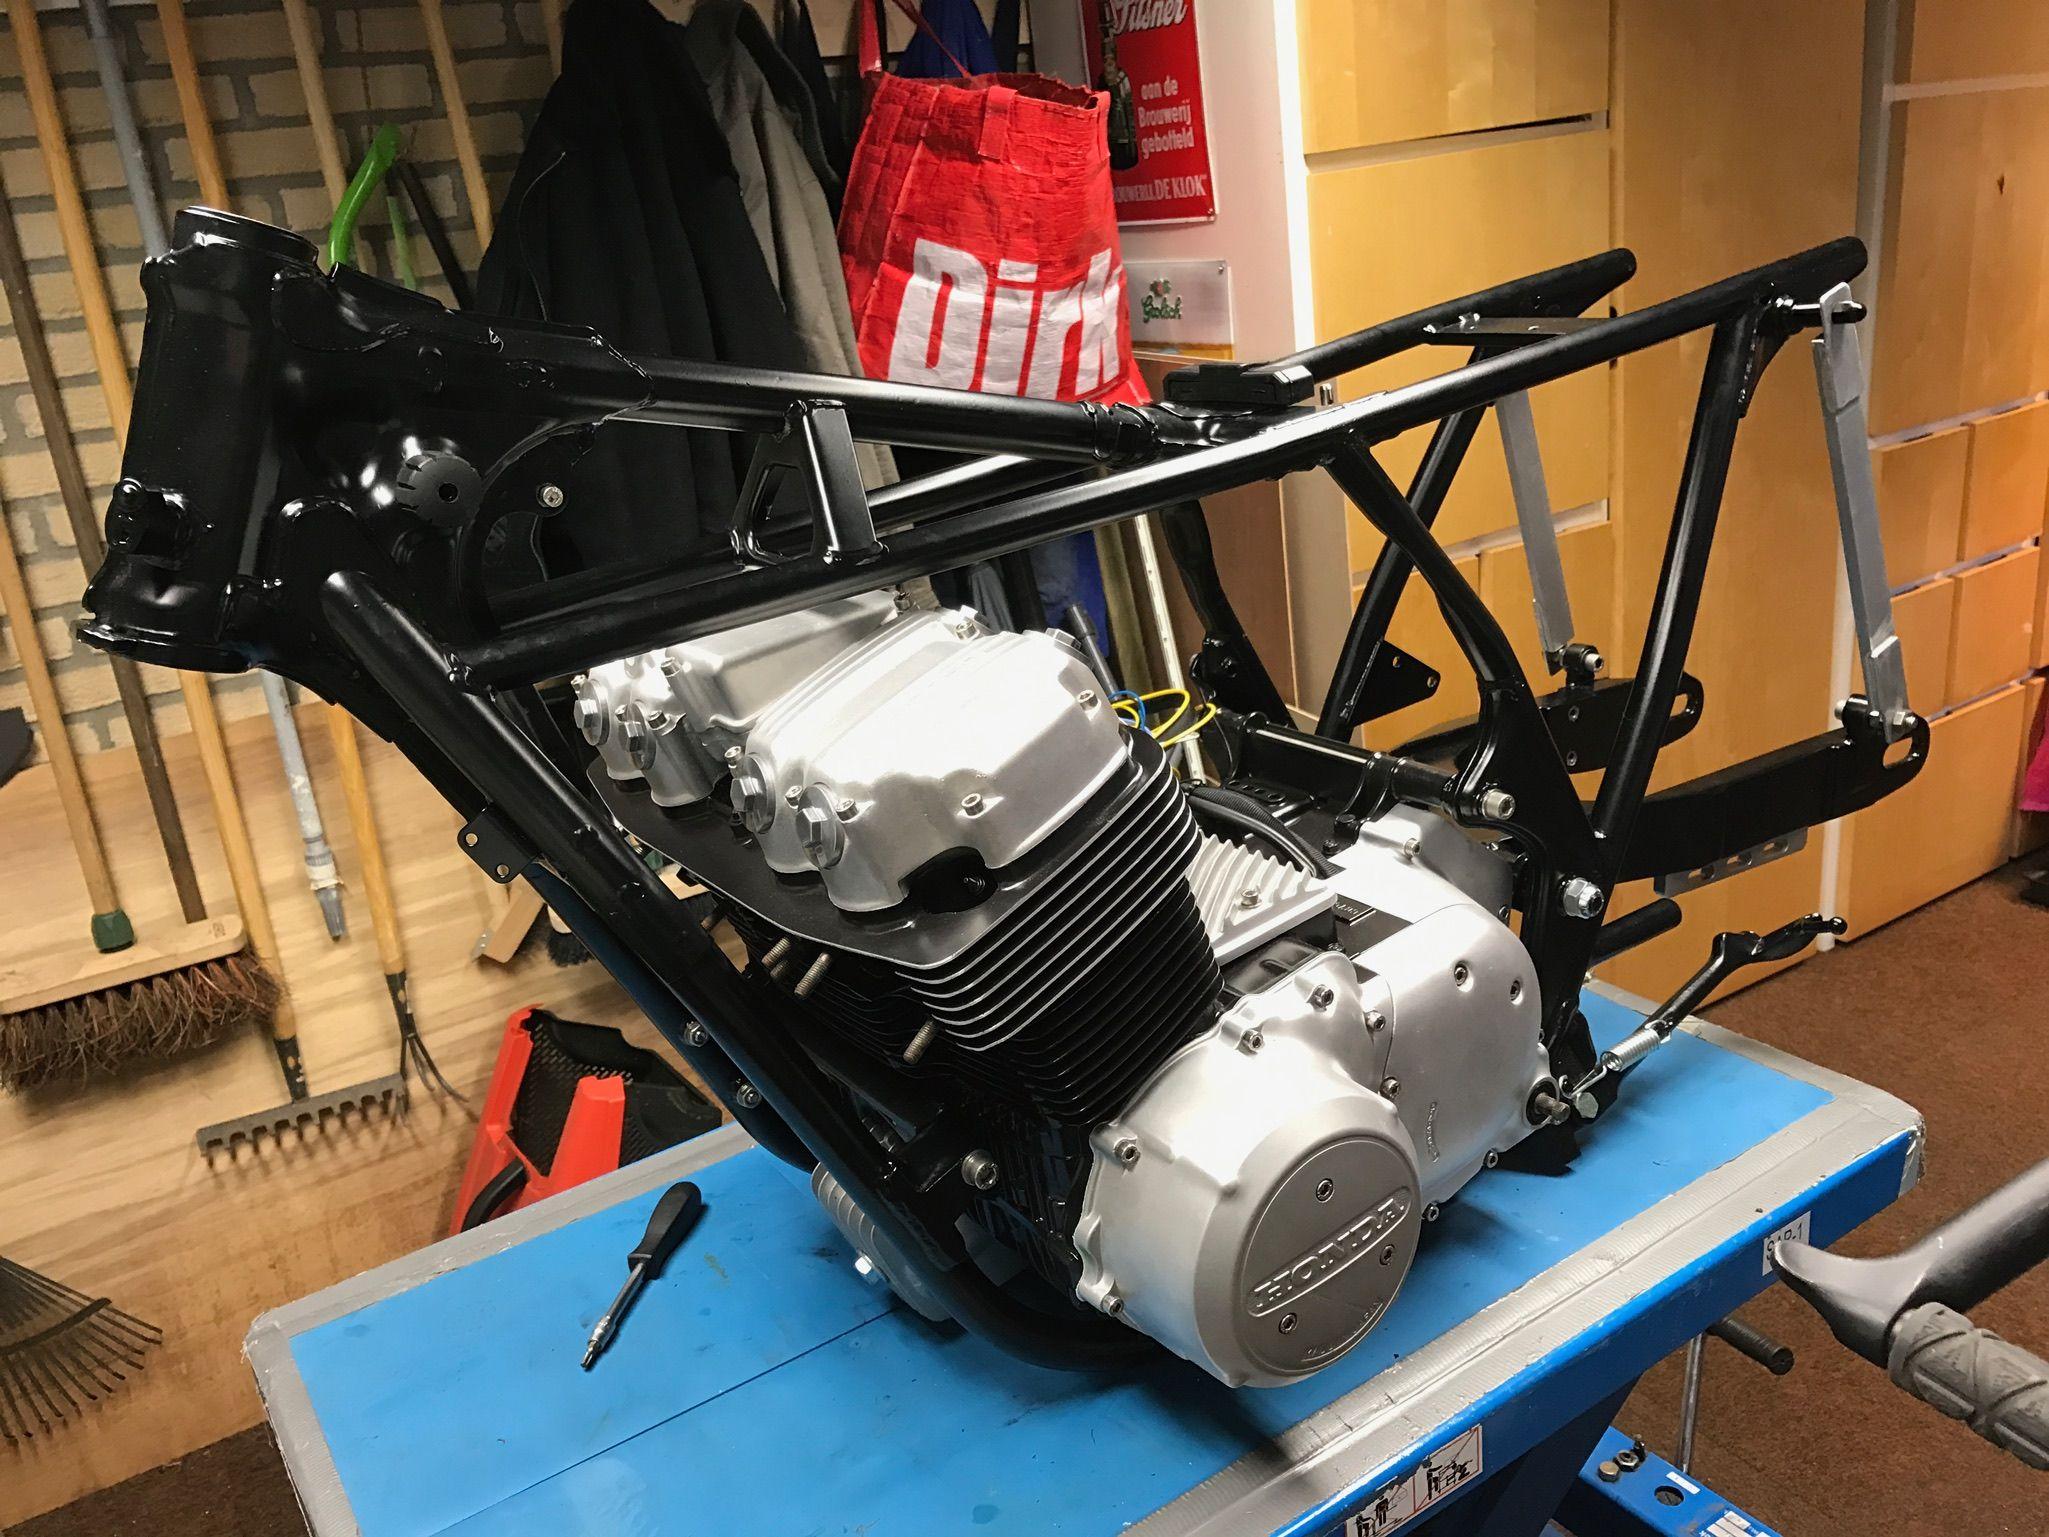 powder coated frame with a cb750 refurbished engine | Cafe